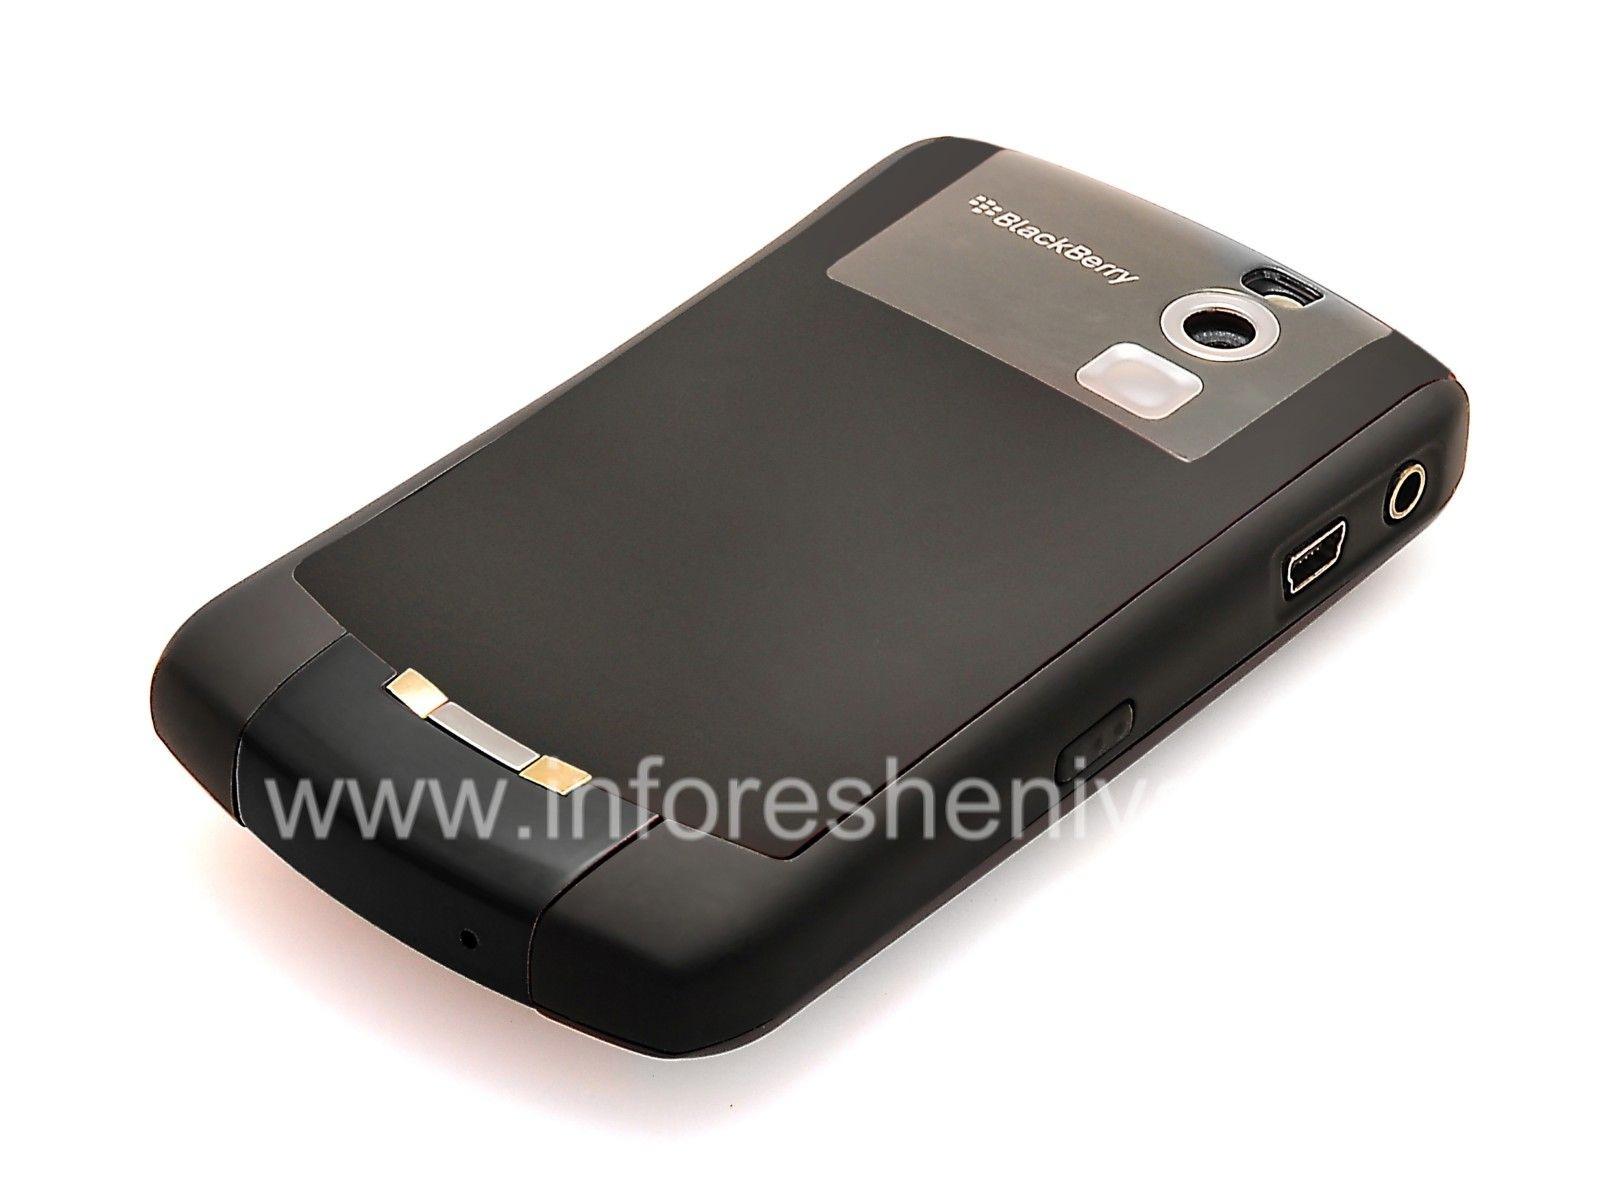 ... Photo 18 — Smartphone BlackBerry 8300 / 8310/8320 Curve, Black ...